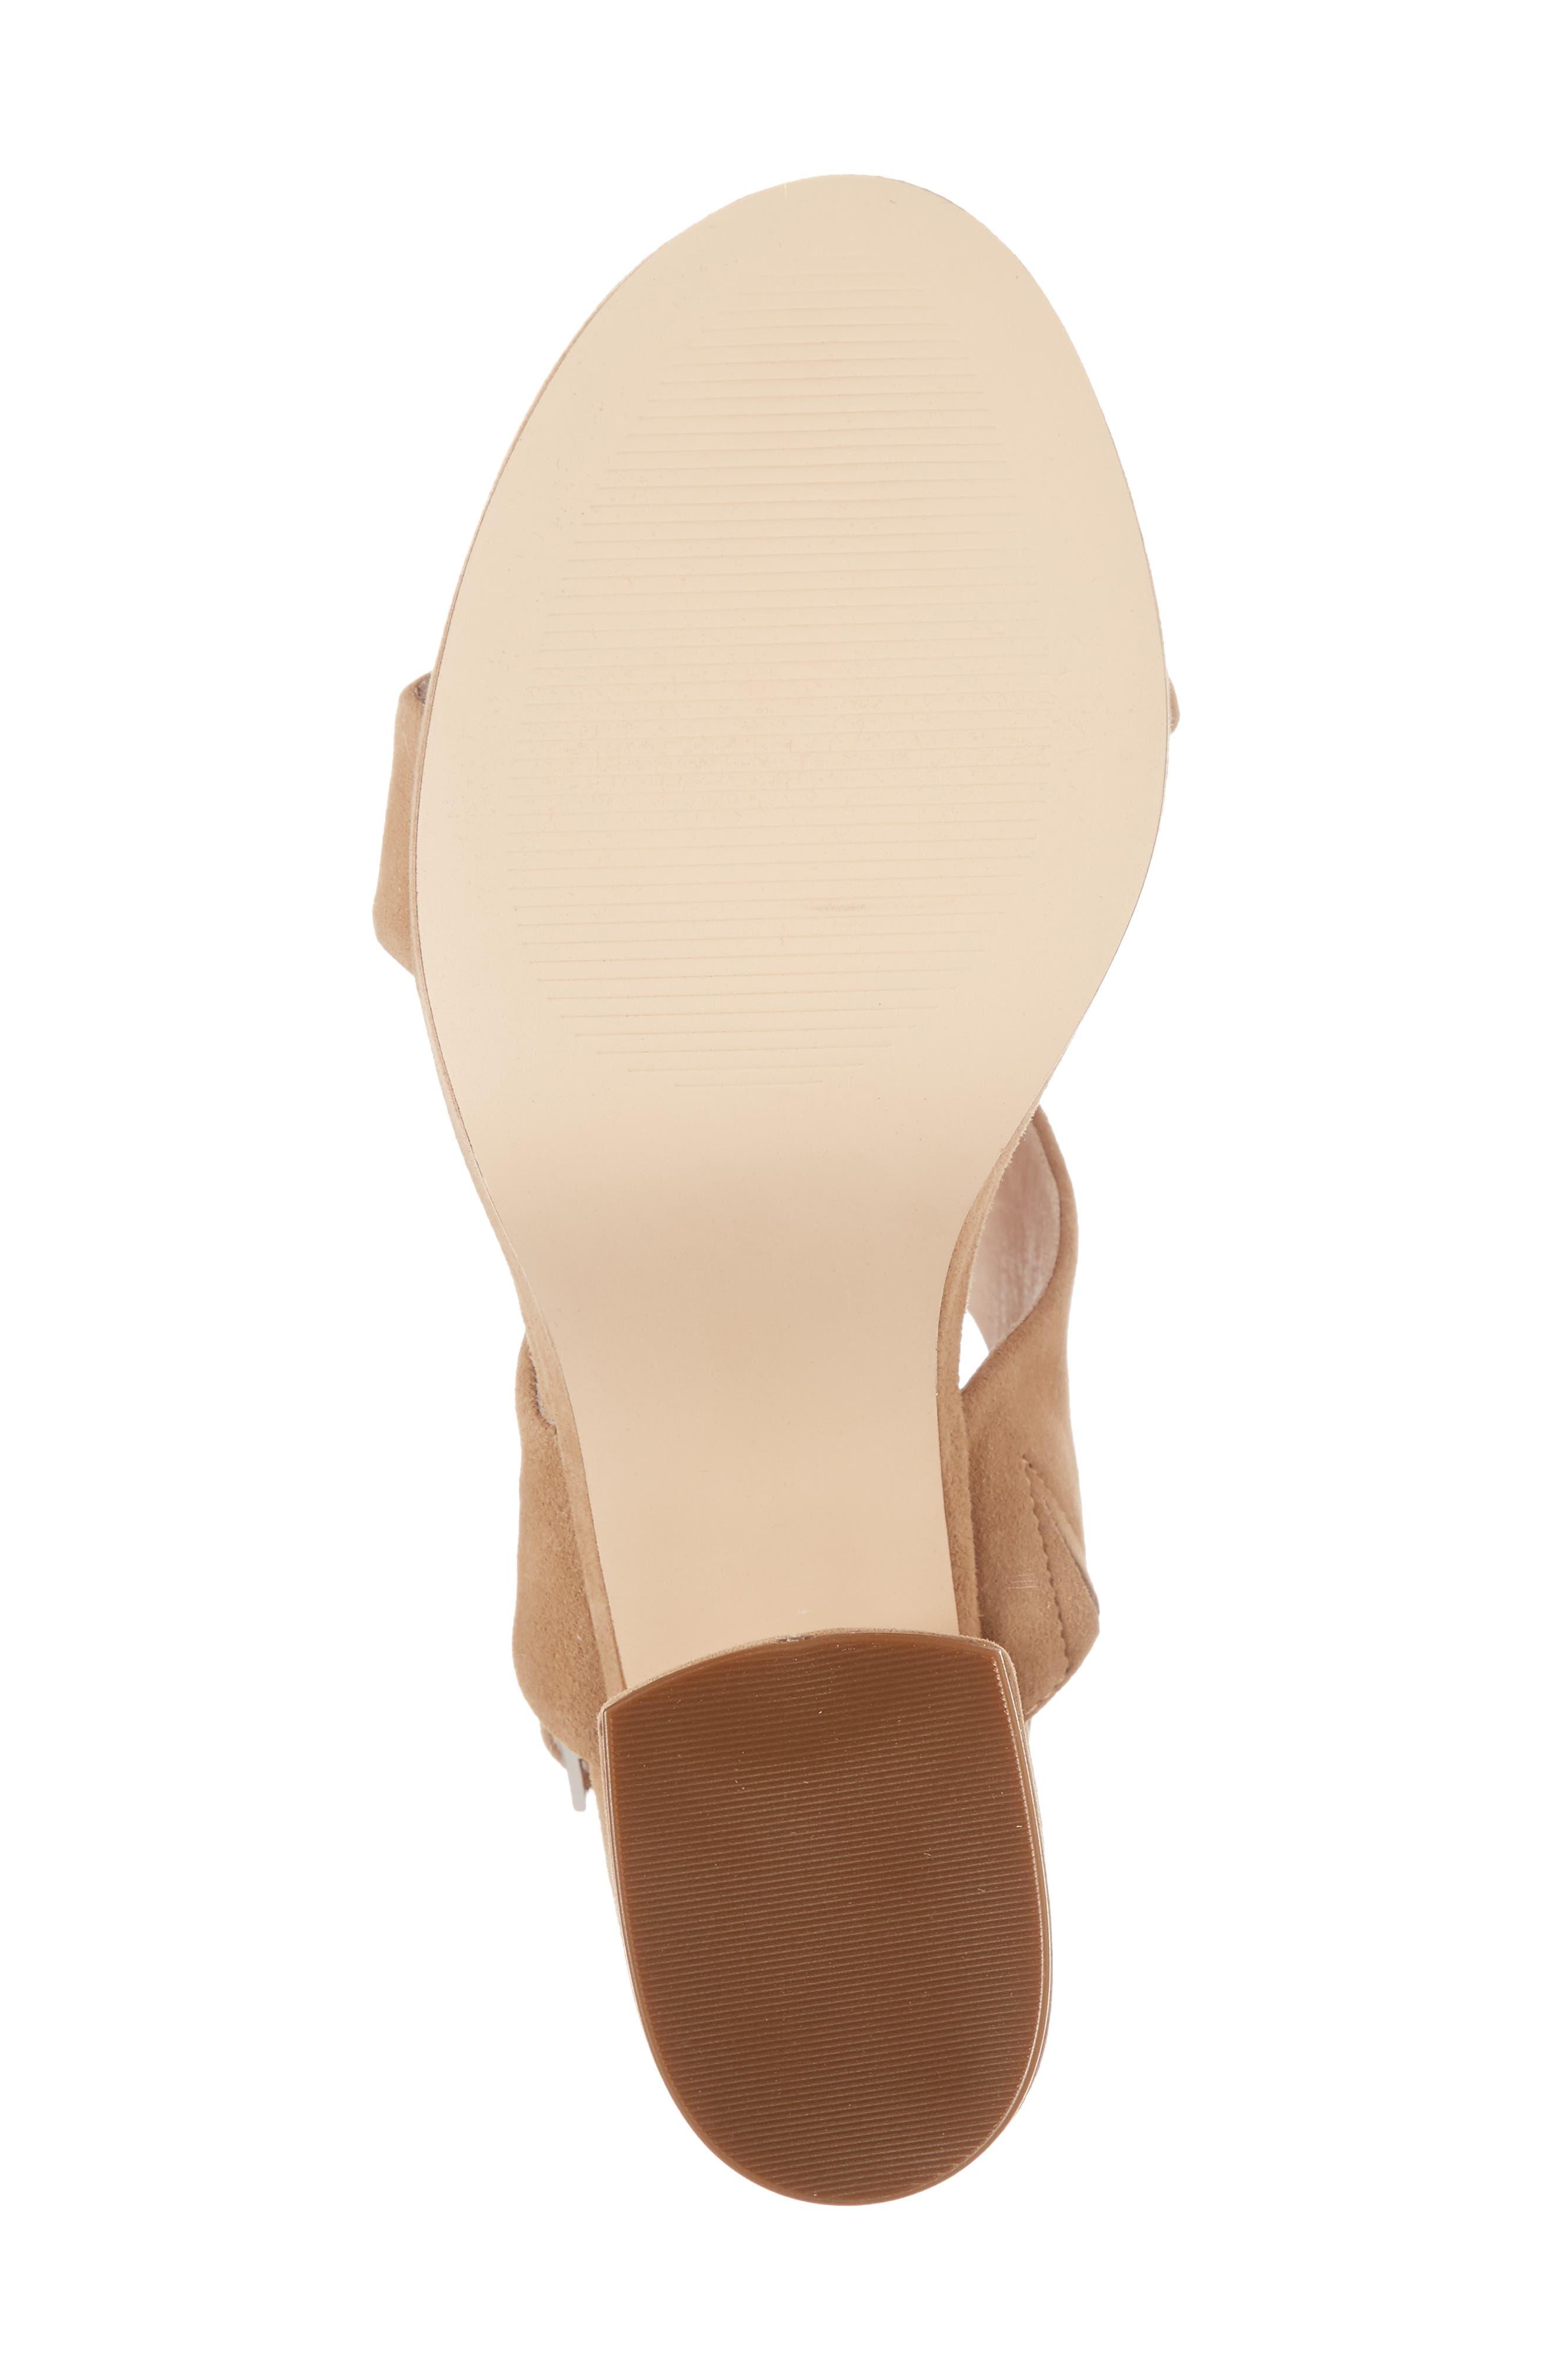 Reba Slingback Platform Sandal,                             Alternate thumbnail 6, color,                             TAN SUEDE